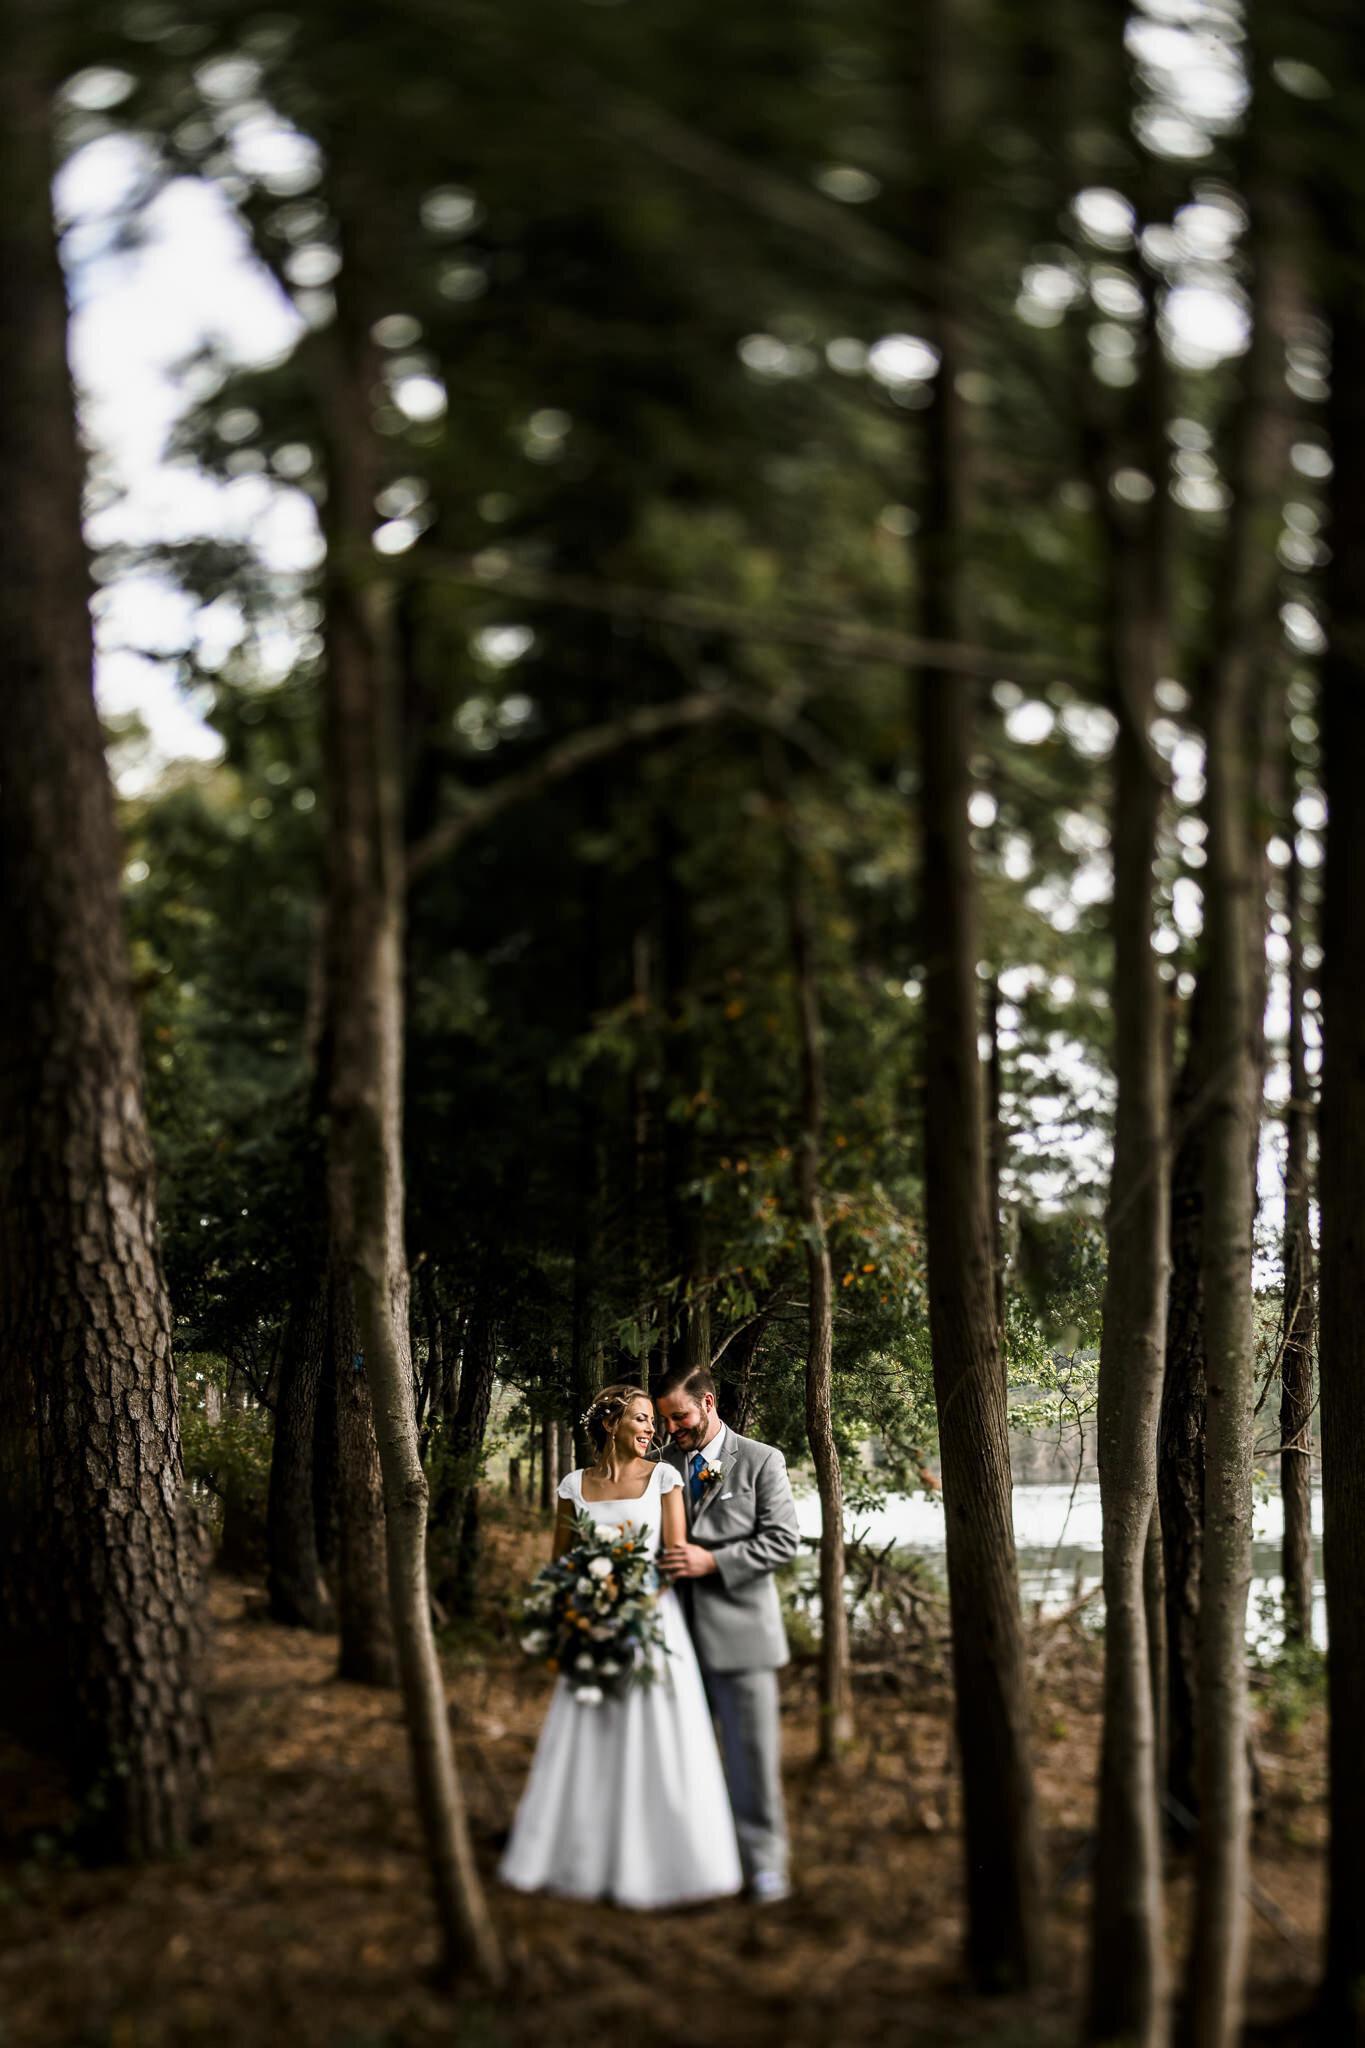 Niemann-Camp-Inawendiwin-New-Jersey-Wedding-Photographer-24.JPG